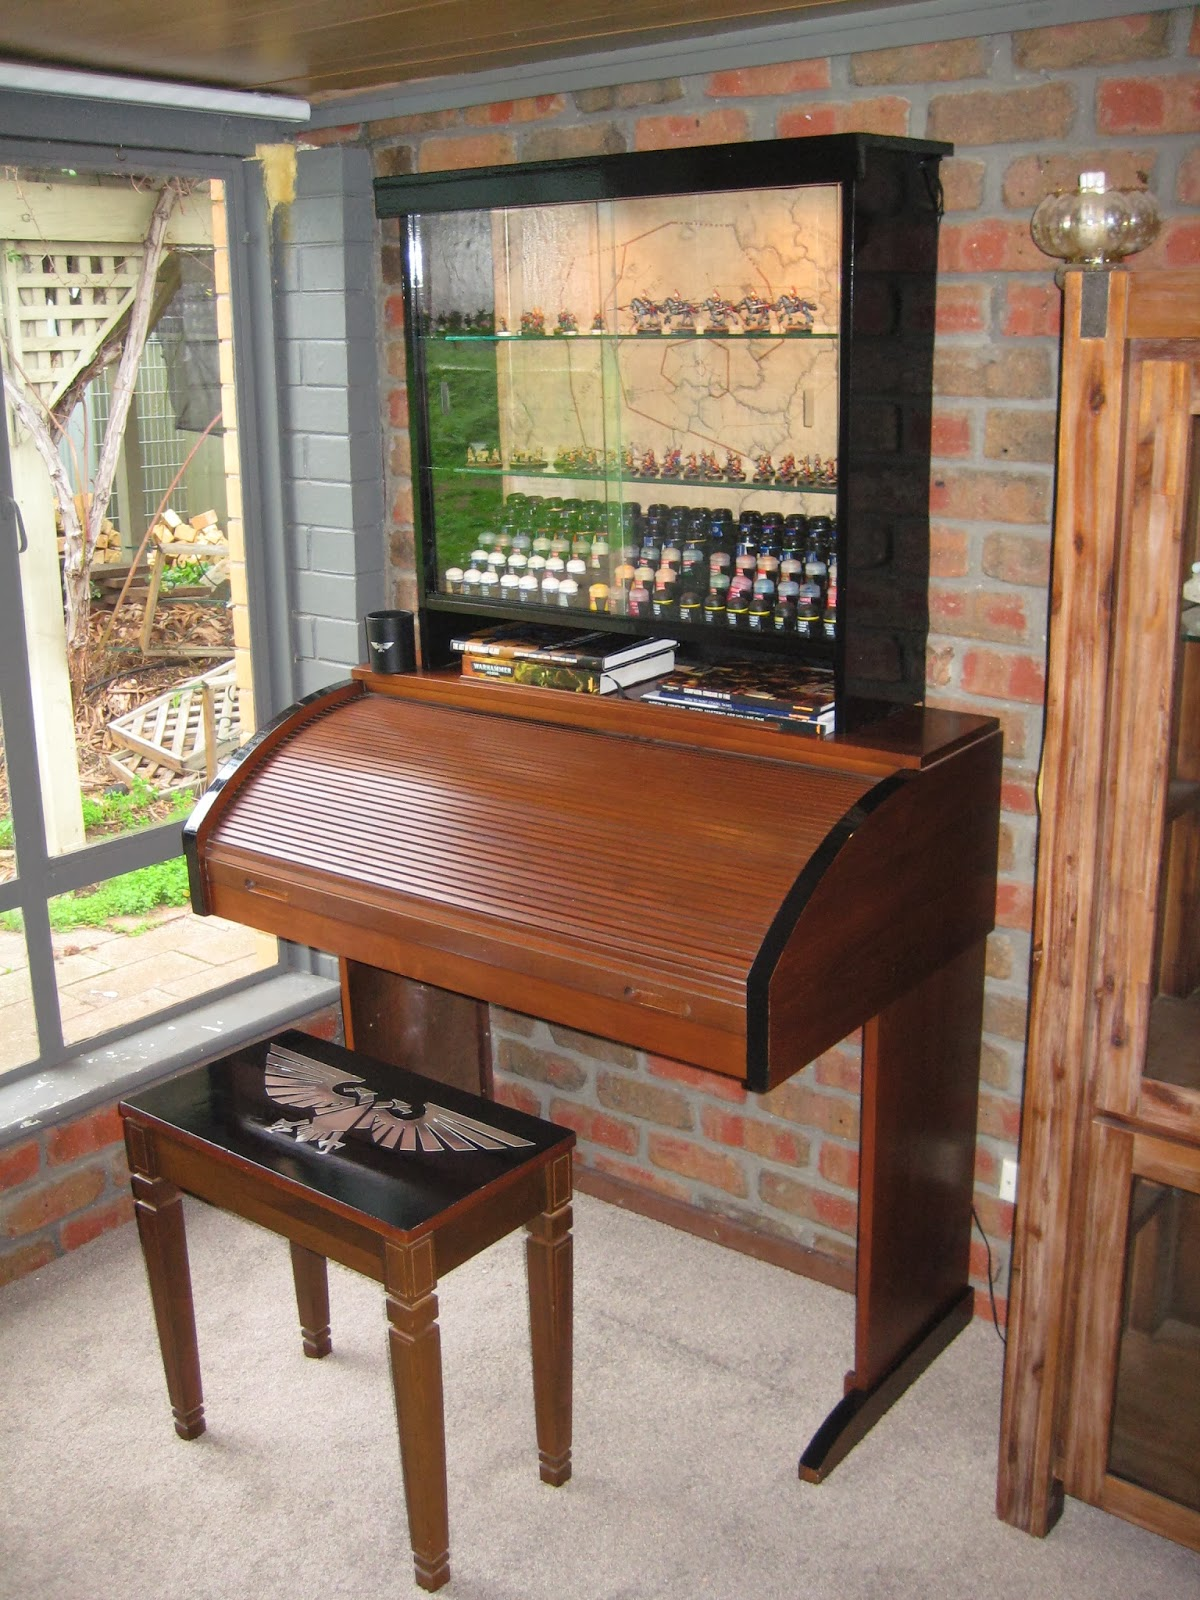 The Thunder Guard Diy Hobby Desk